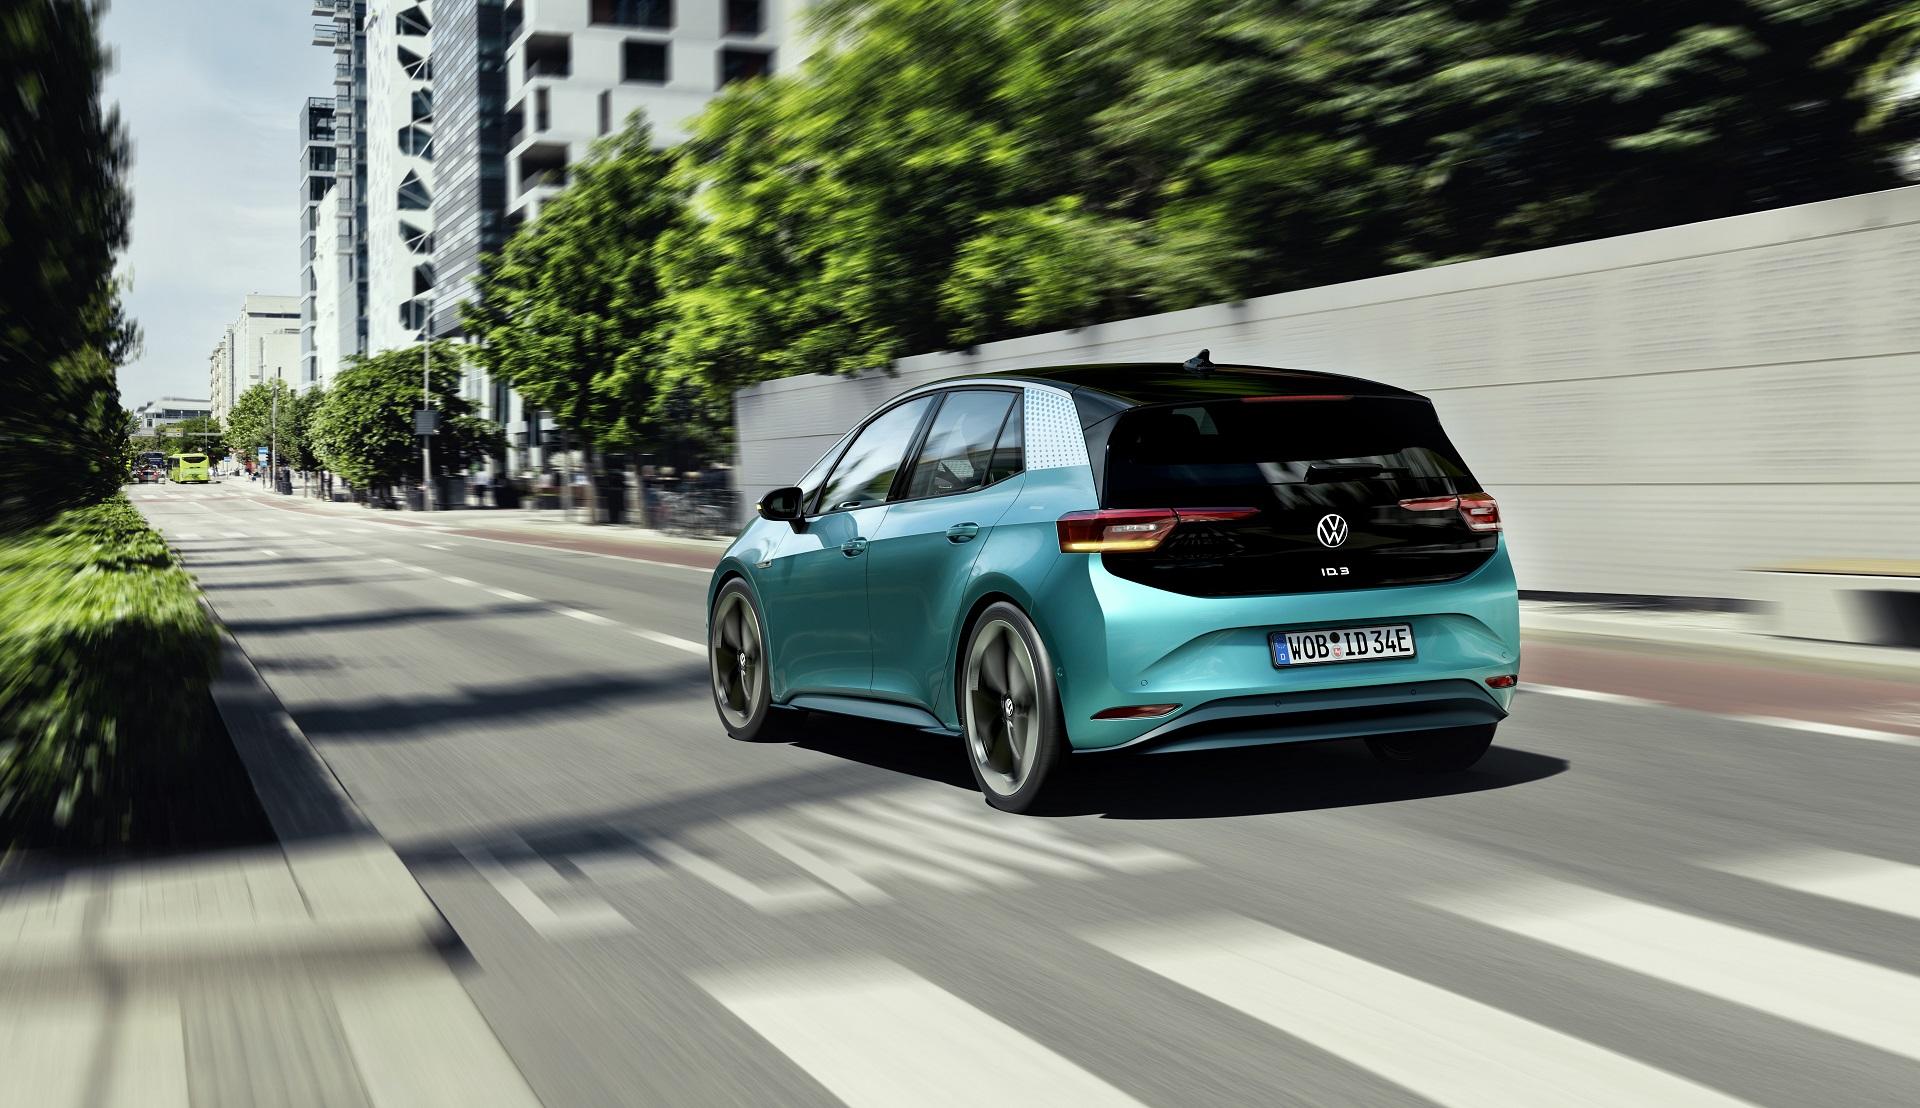 H Volkswagen αποκαλύπτει το ηλεκτρικό ID.3 [εικόνες]